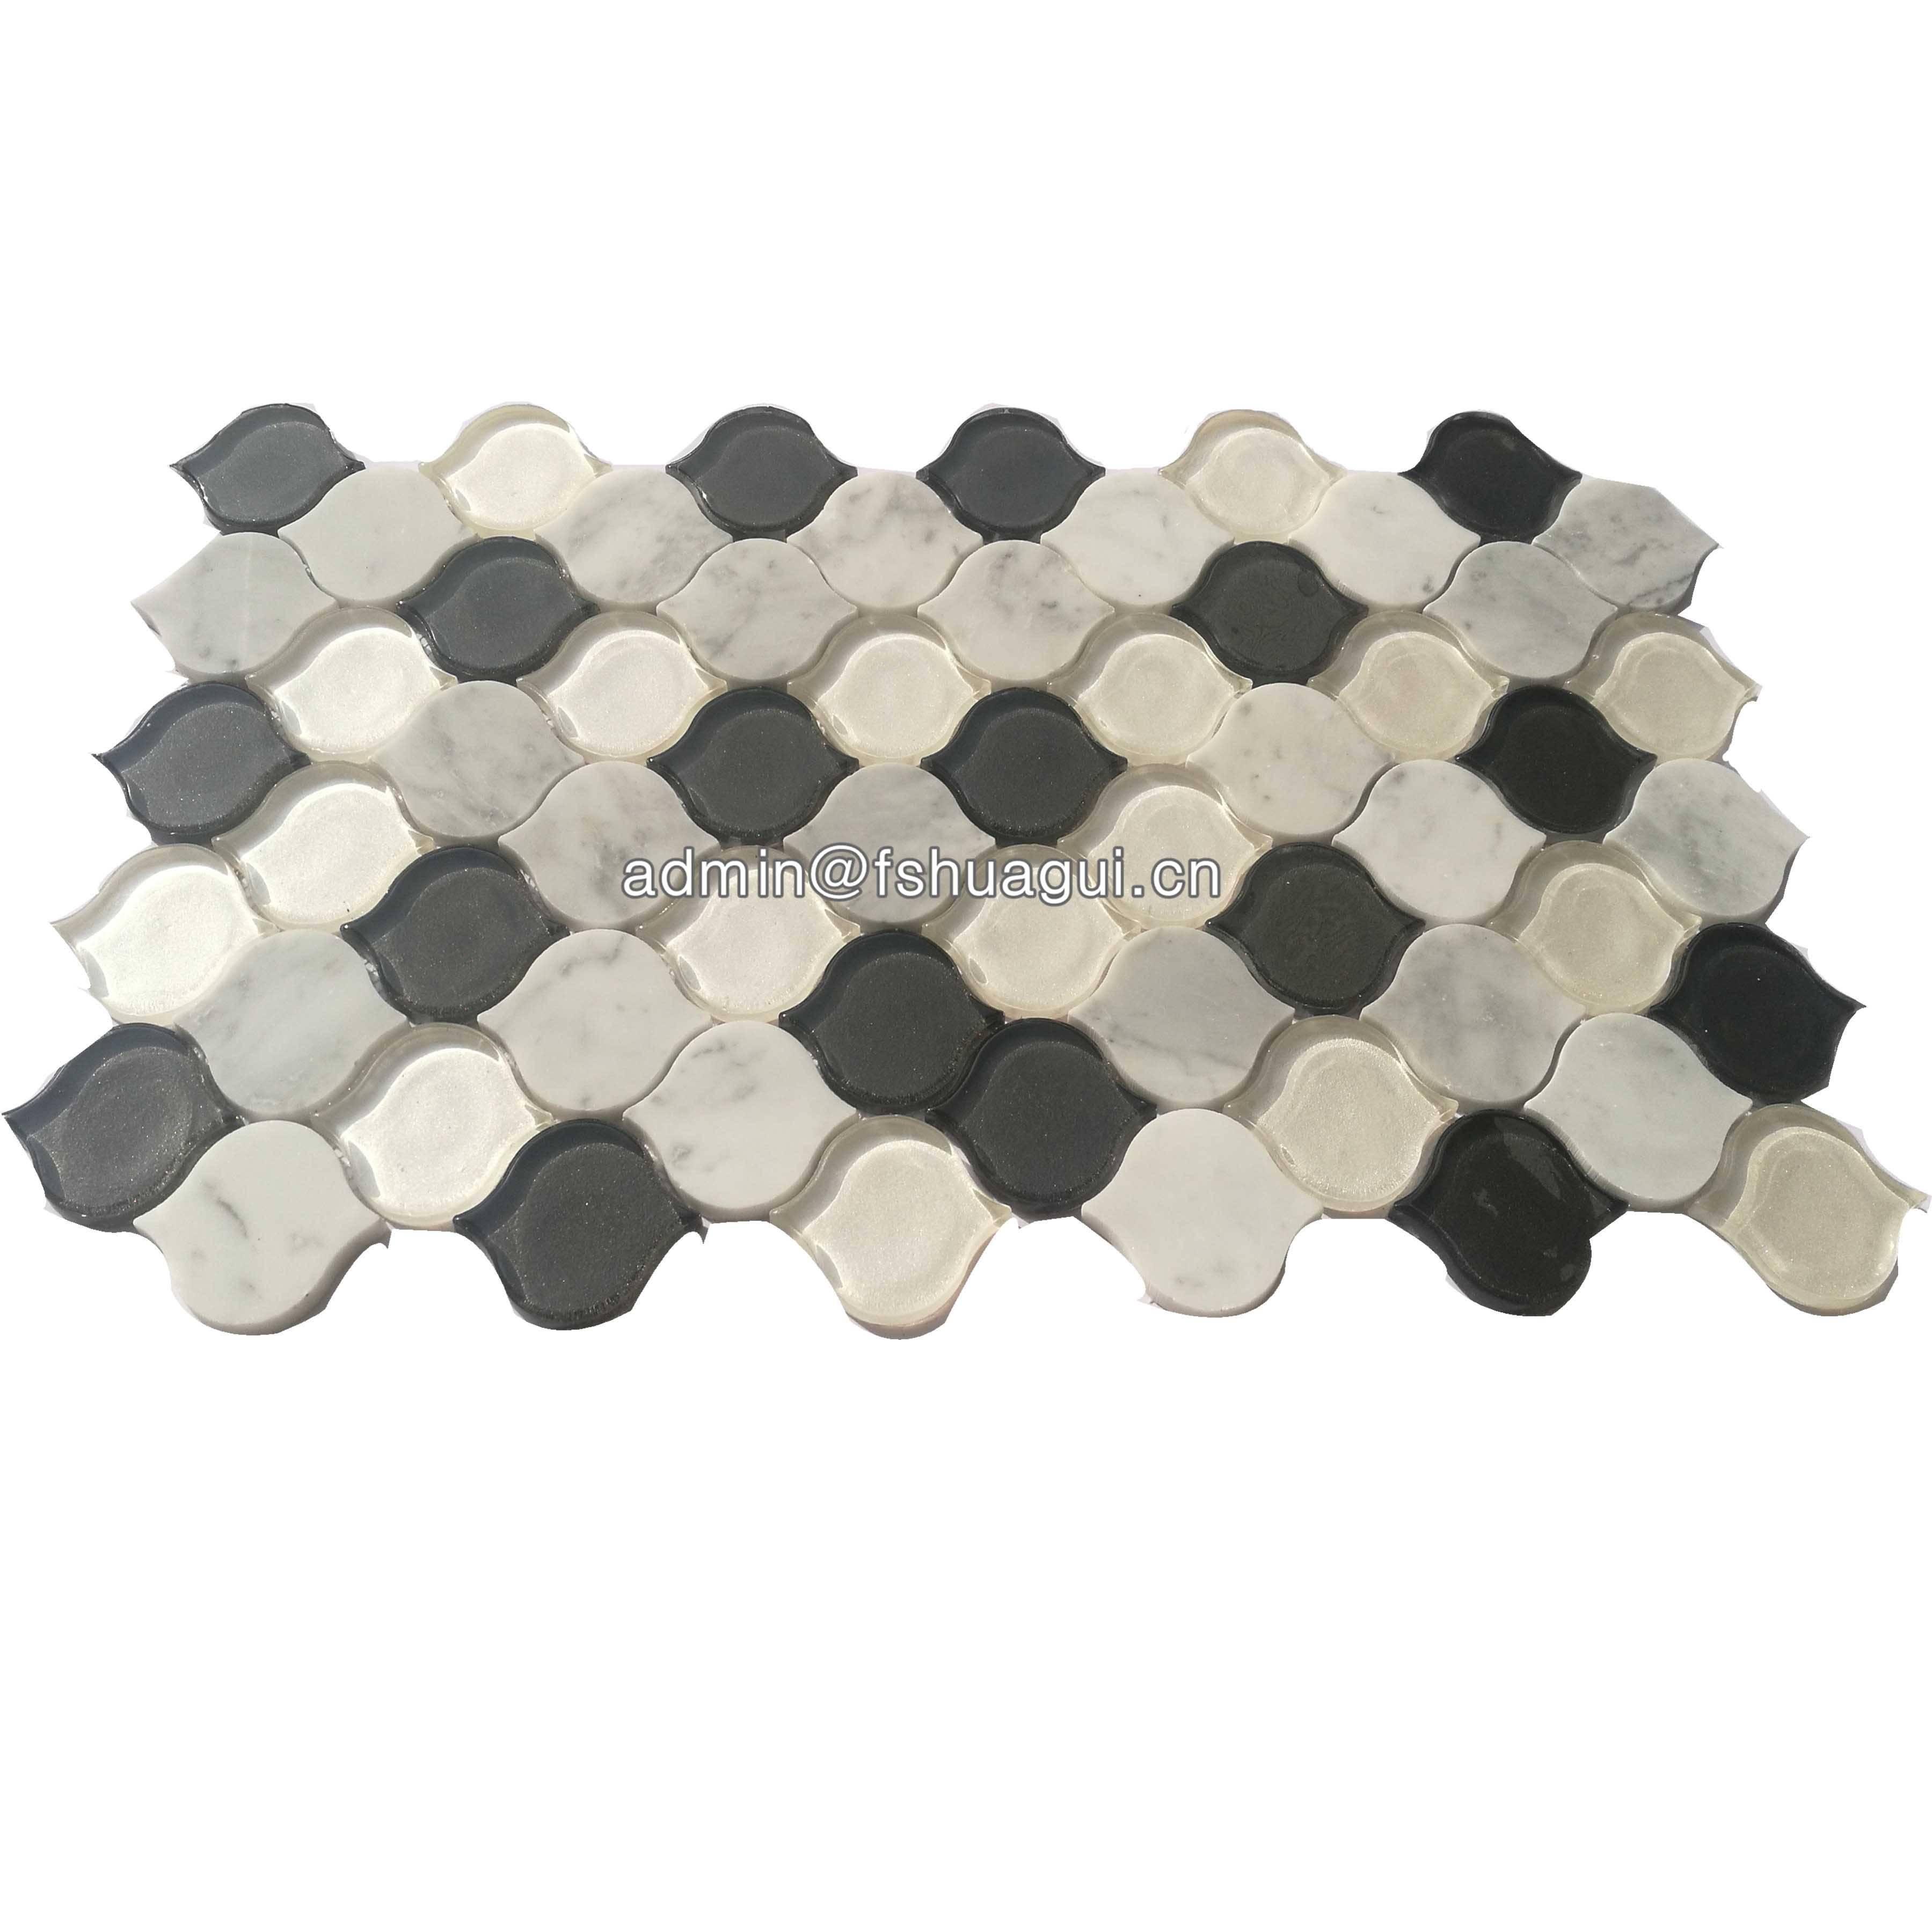 Huagui Beige and white arabesque glass stone mosaic tile HG-WJ401 GLASS MOSAIC TILE image28